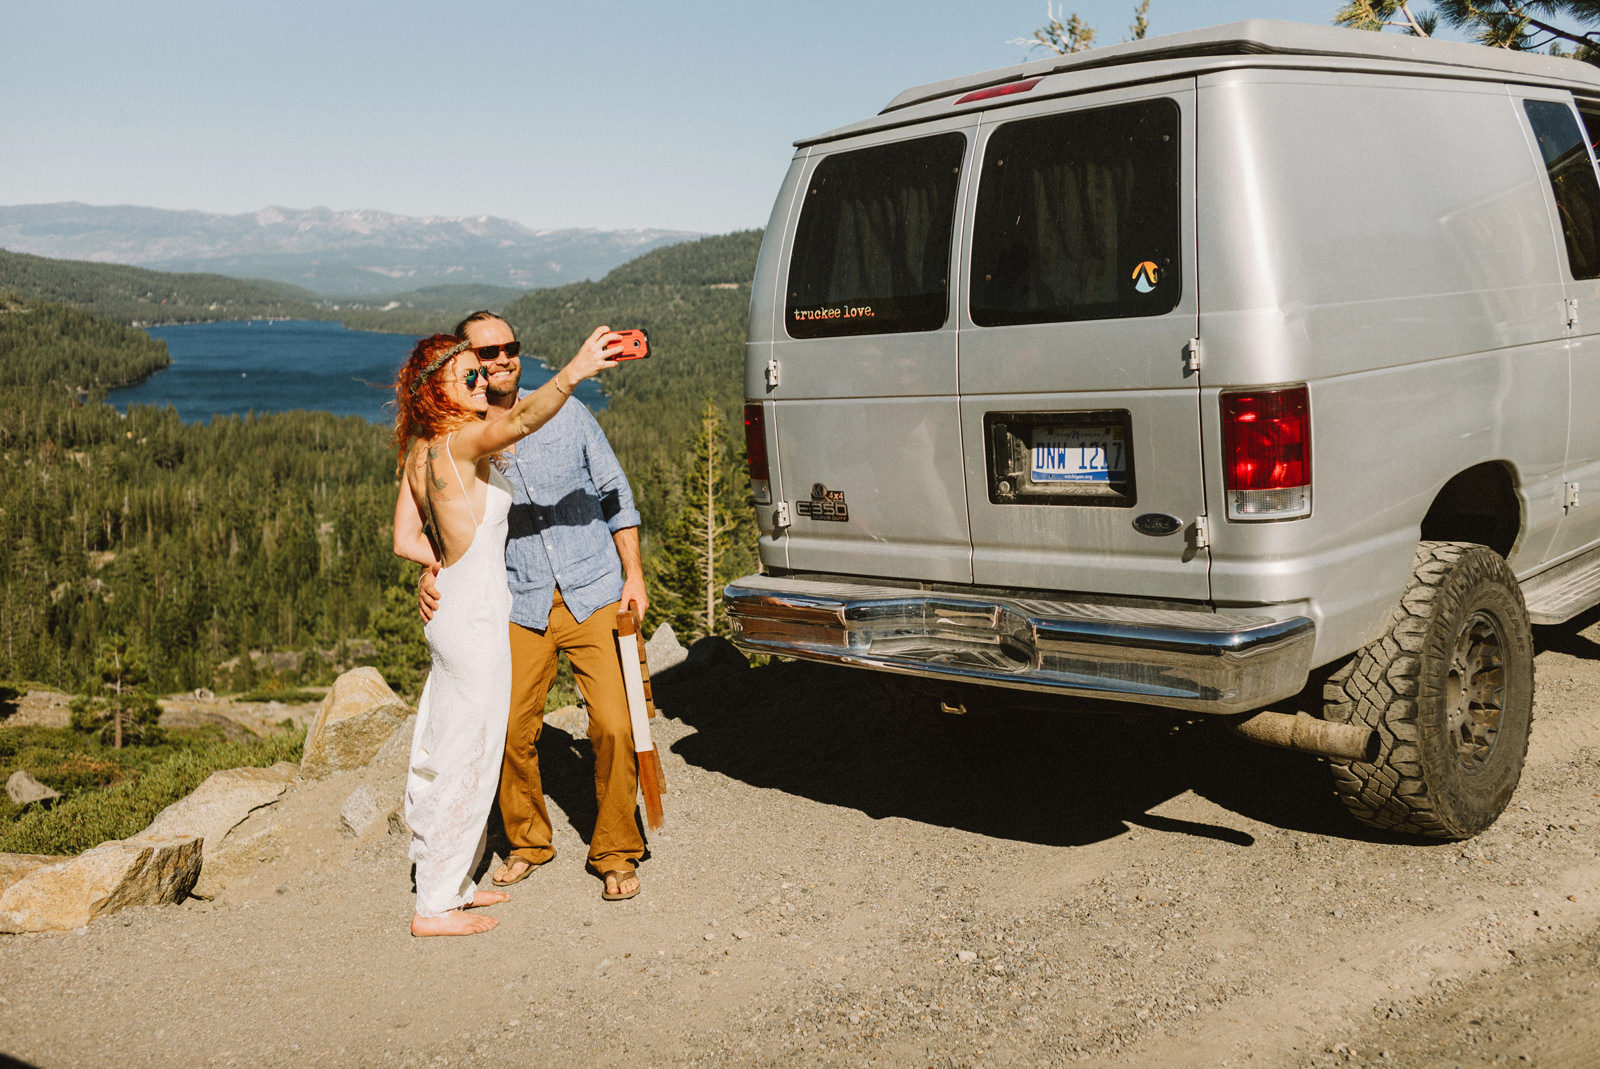 lake-tahoe-elopement-039 LAKE TAHOE ELOPEMENT